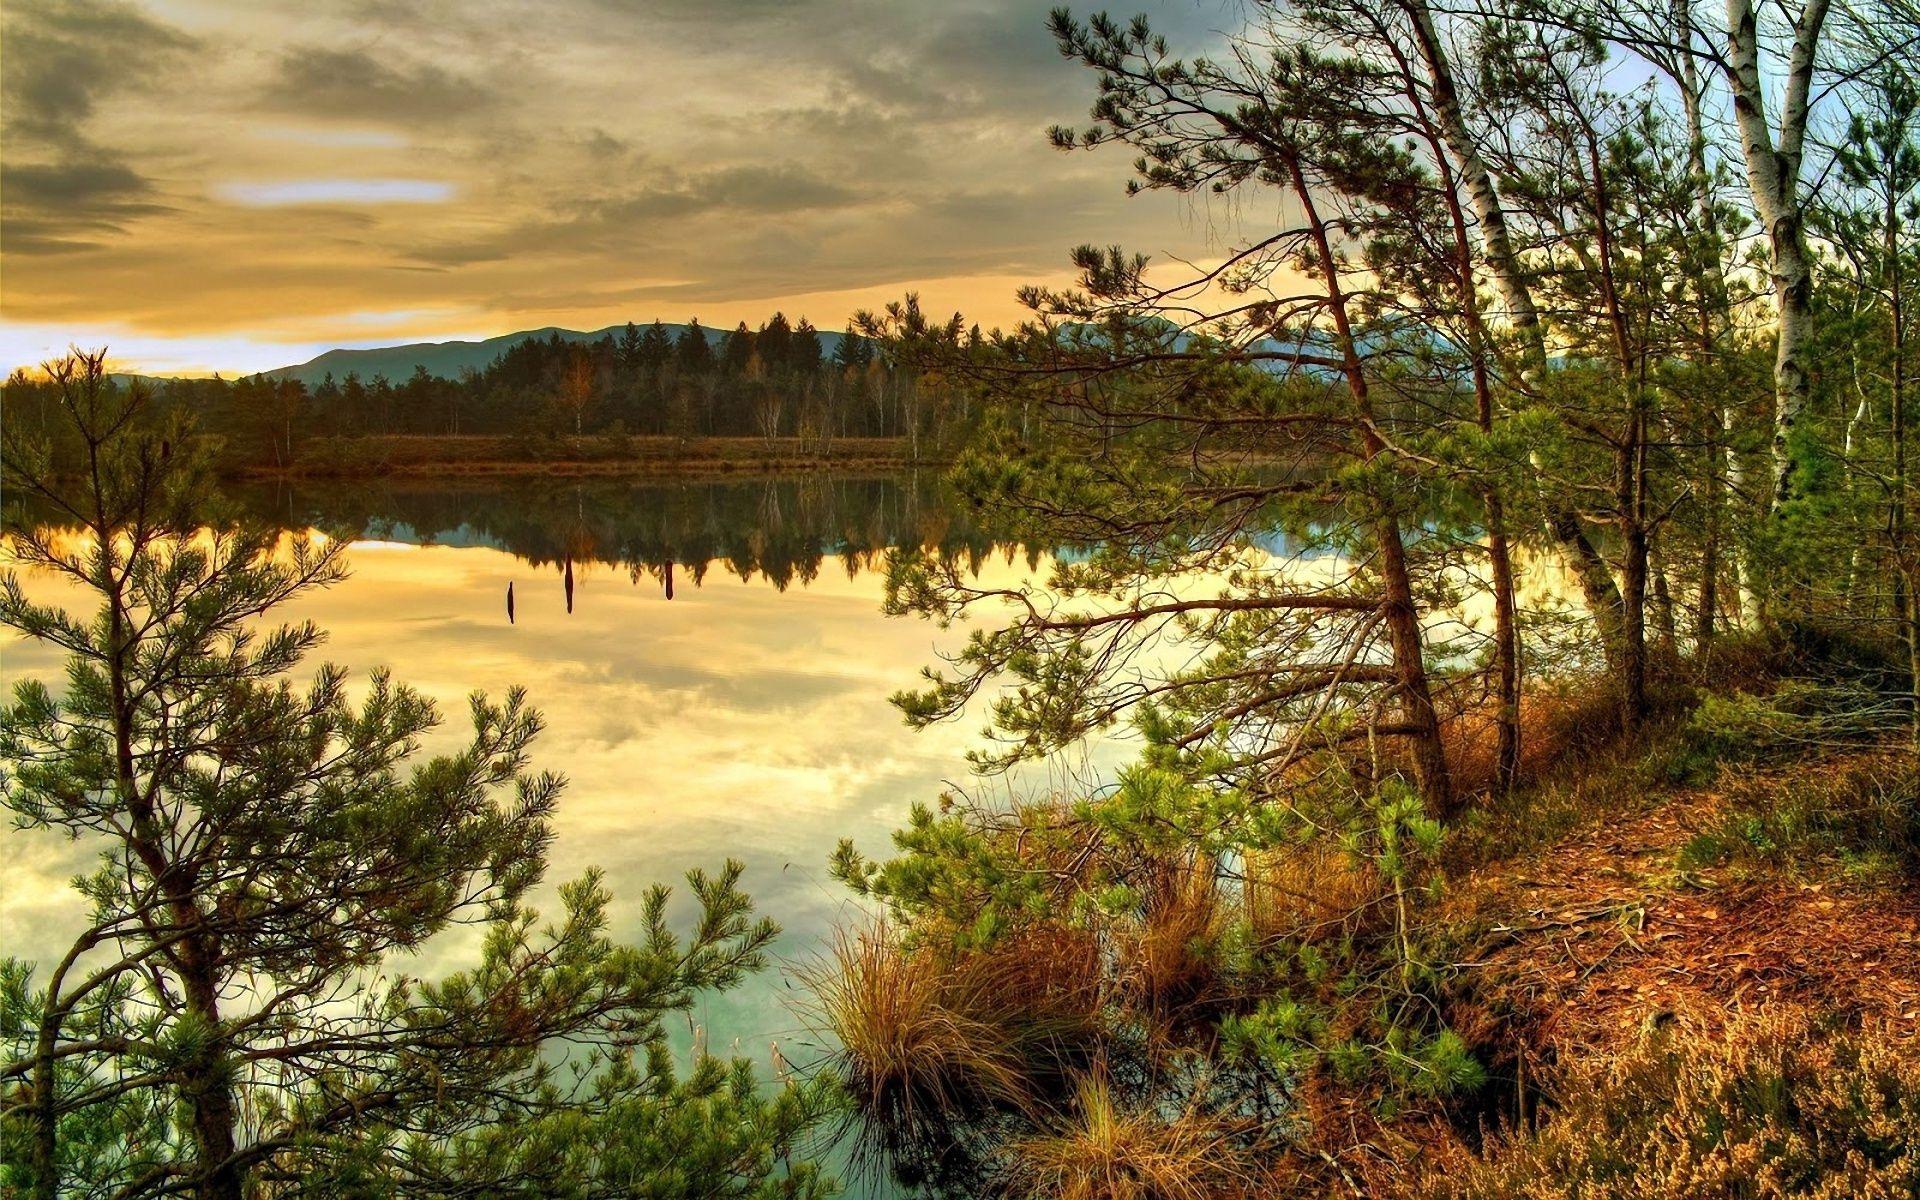 причинах картинки на рабочий стол природа лес озера реки облака меня как раз